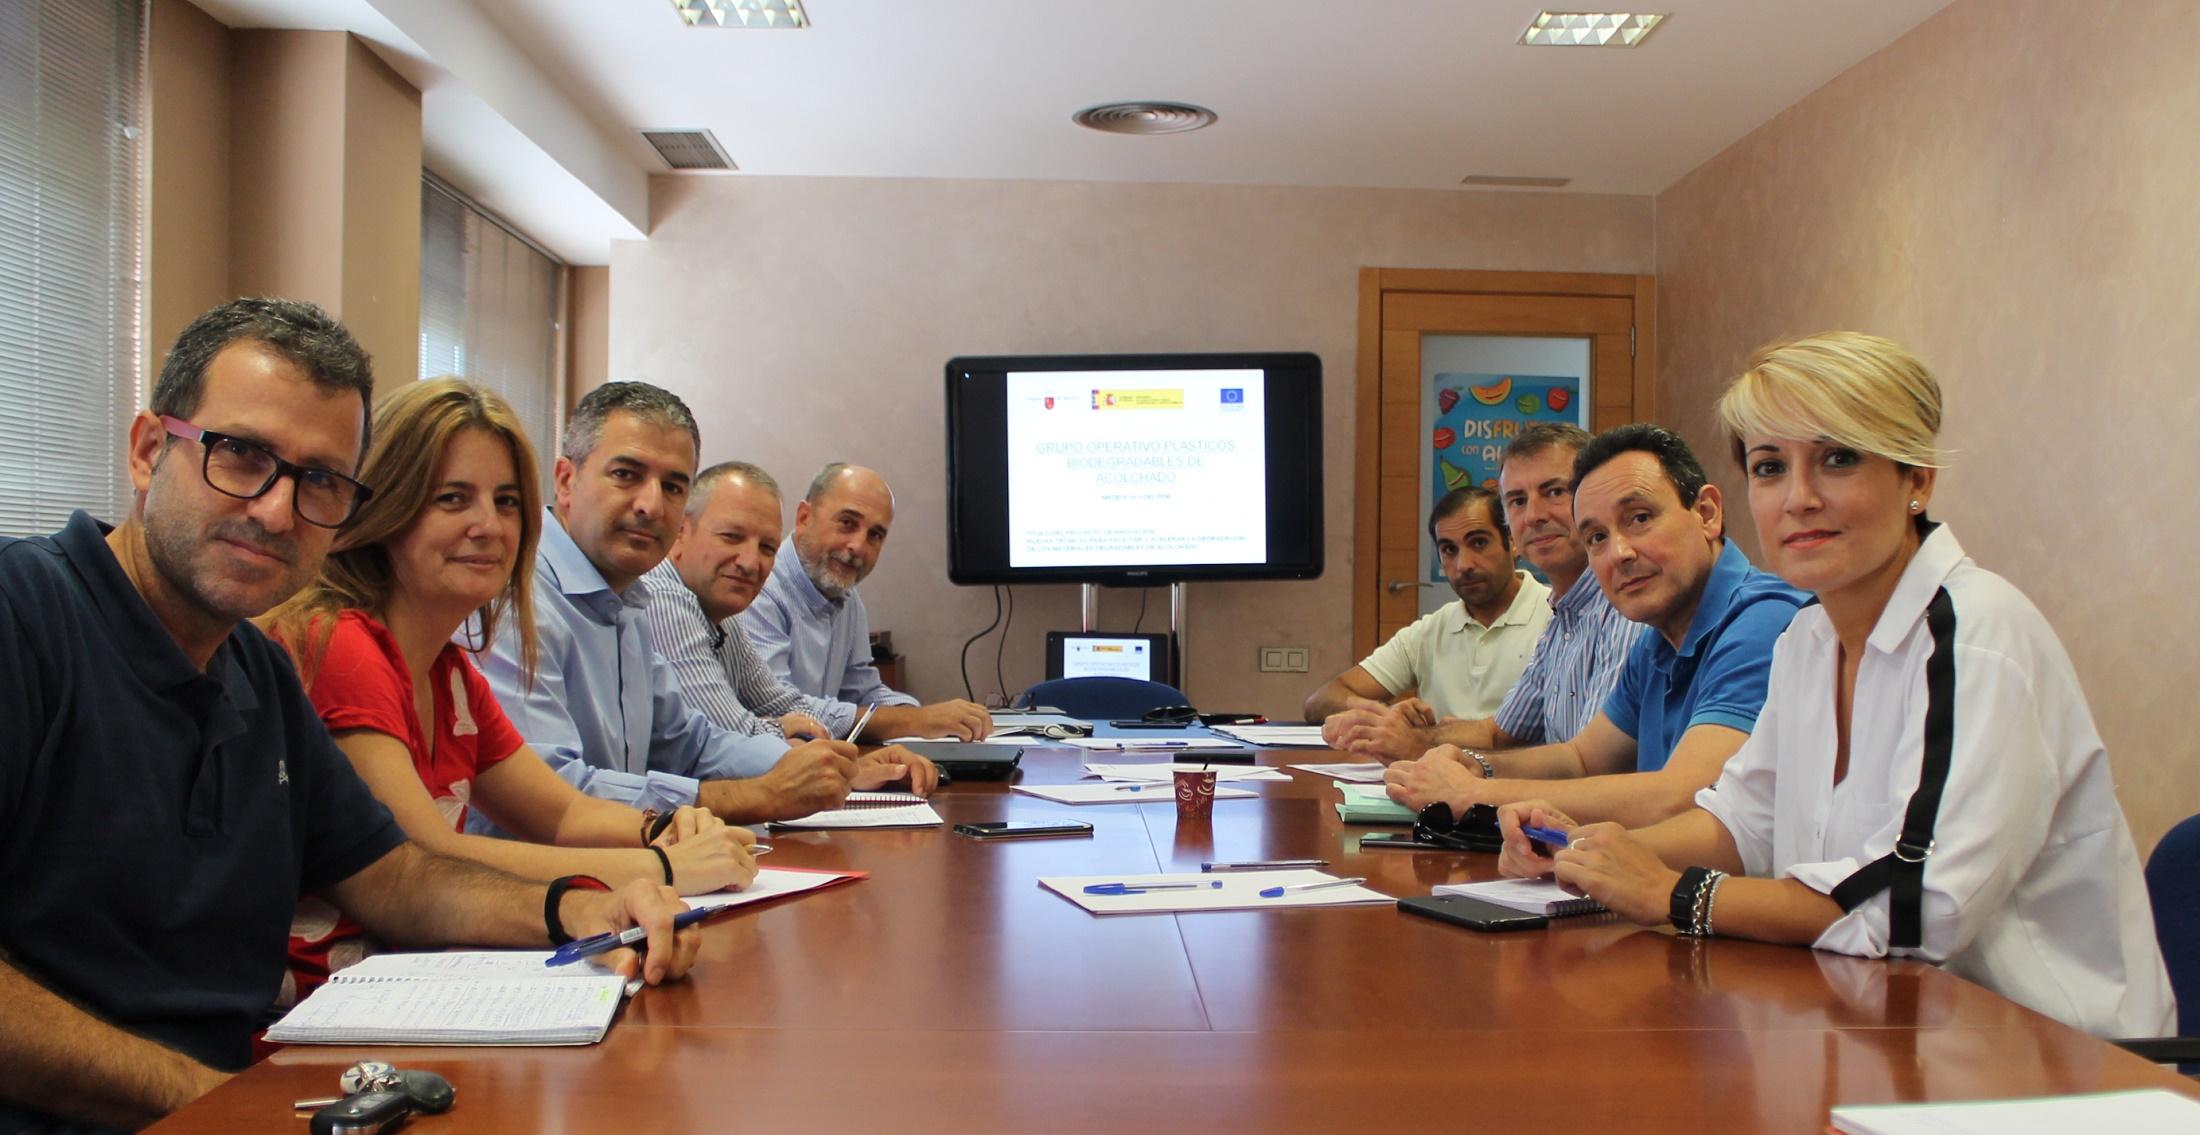 Reunión de los integrantes del Grupo Operativo de Acolchados Biodegradables (ACBD) - proexport